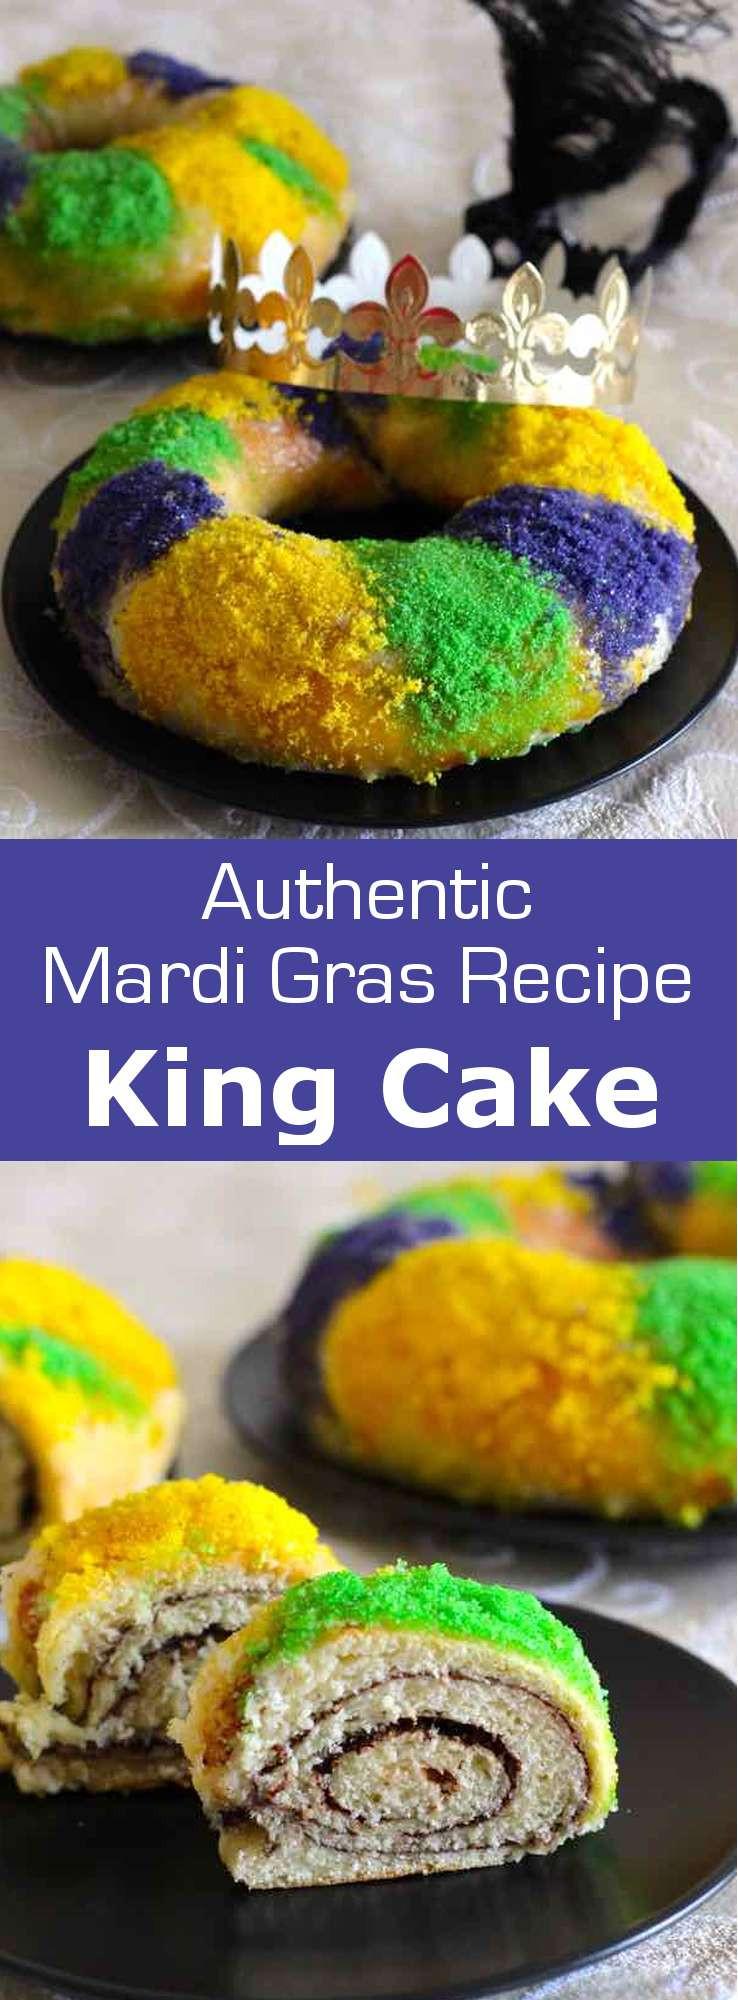 Mardi Gras King Cake Recipe  King Cake Traditional Mardi Gras Recipe